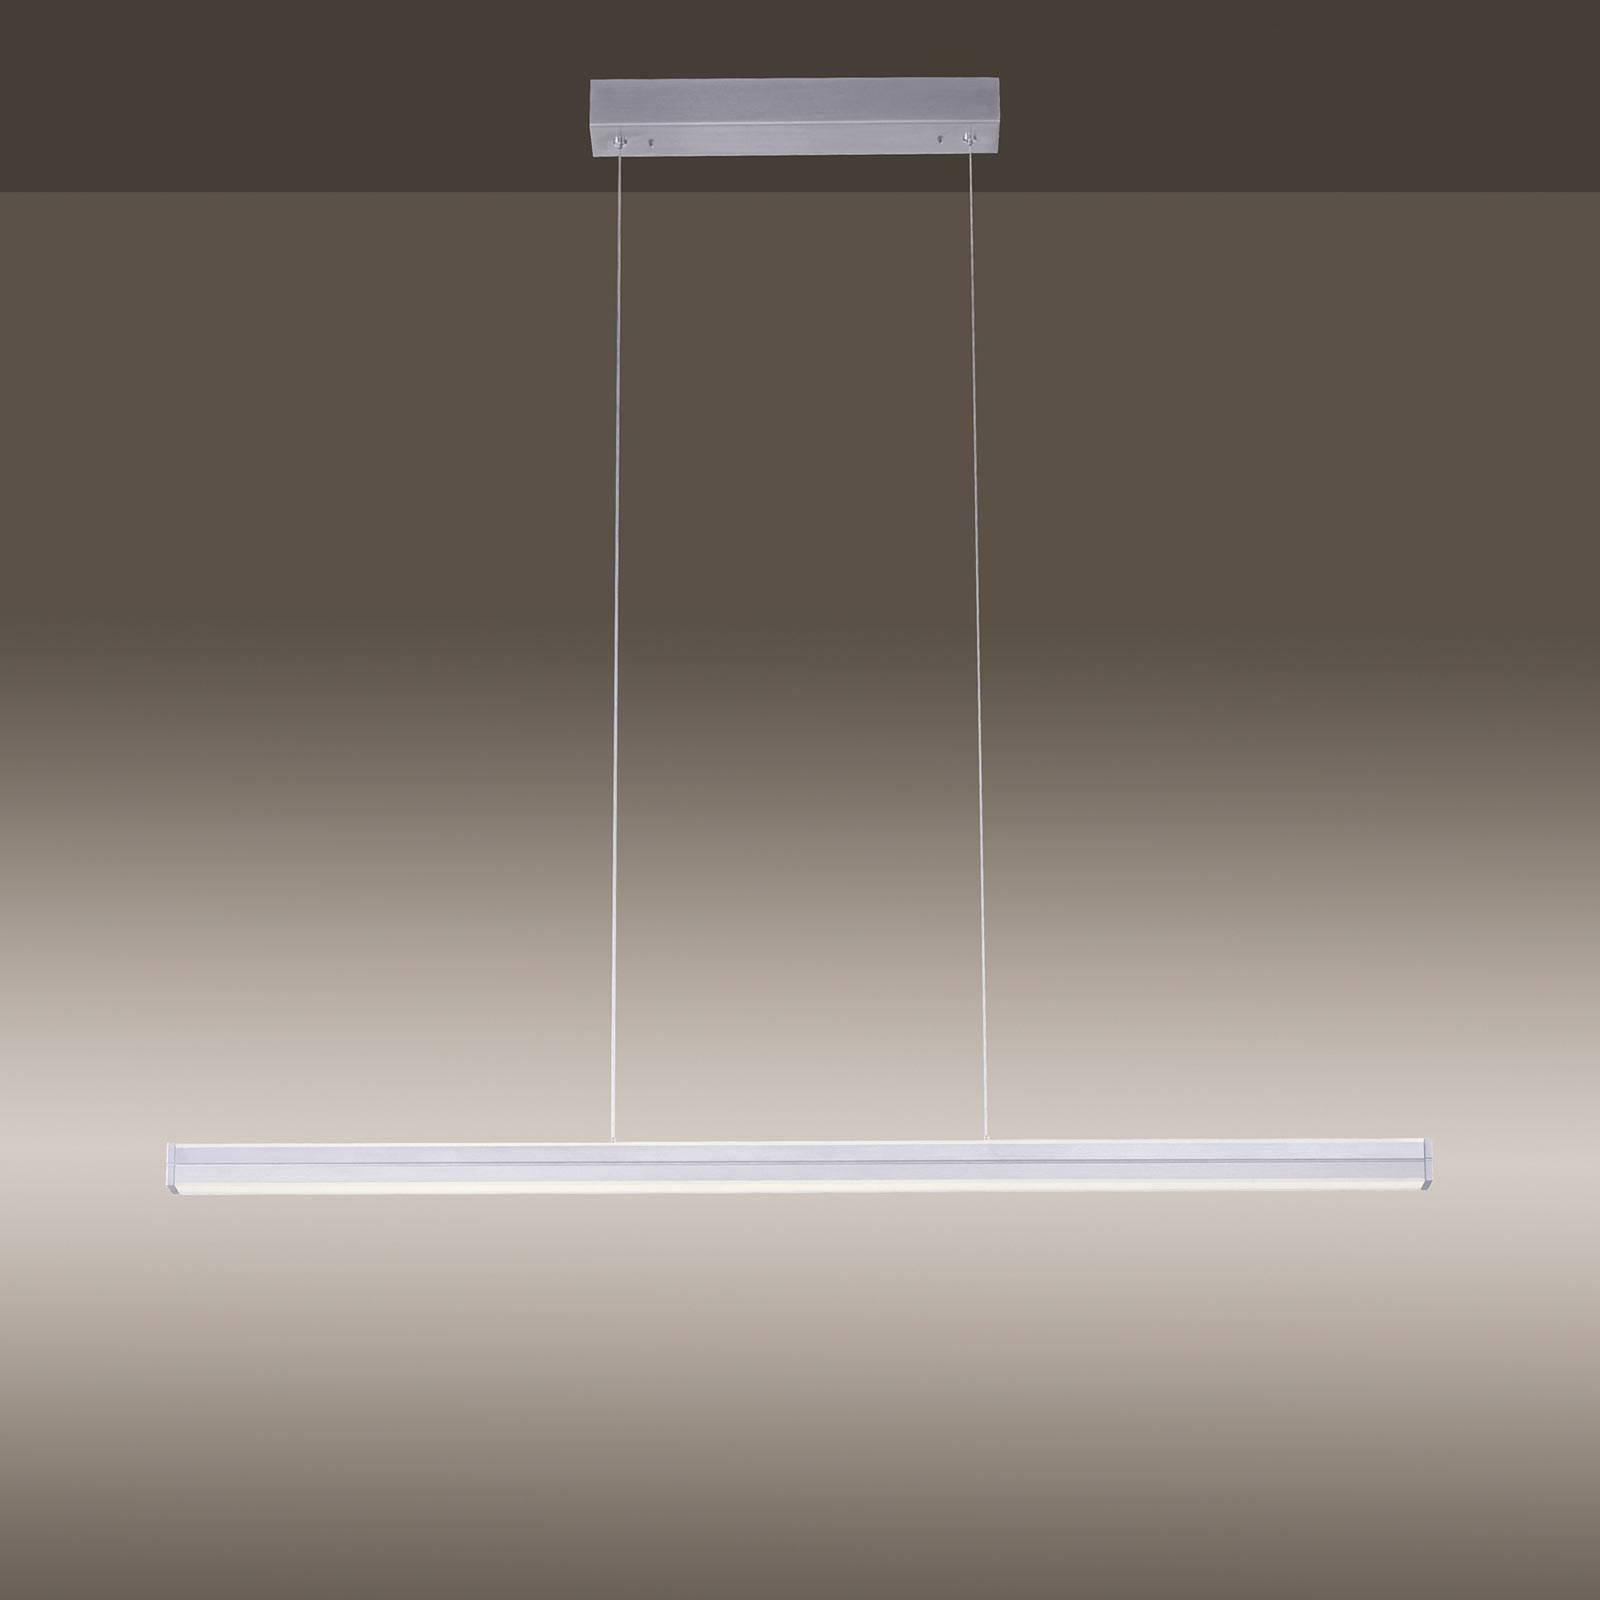 Niro LED-hengelampe, 2 lyskilder, dimbar, CCT